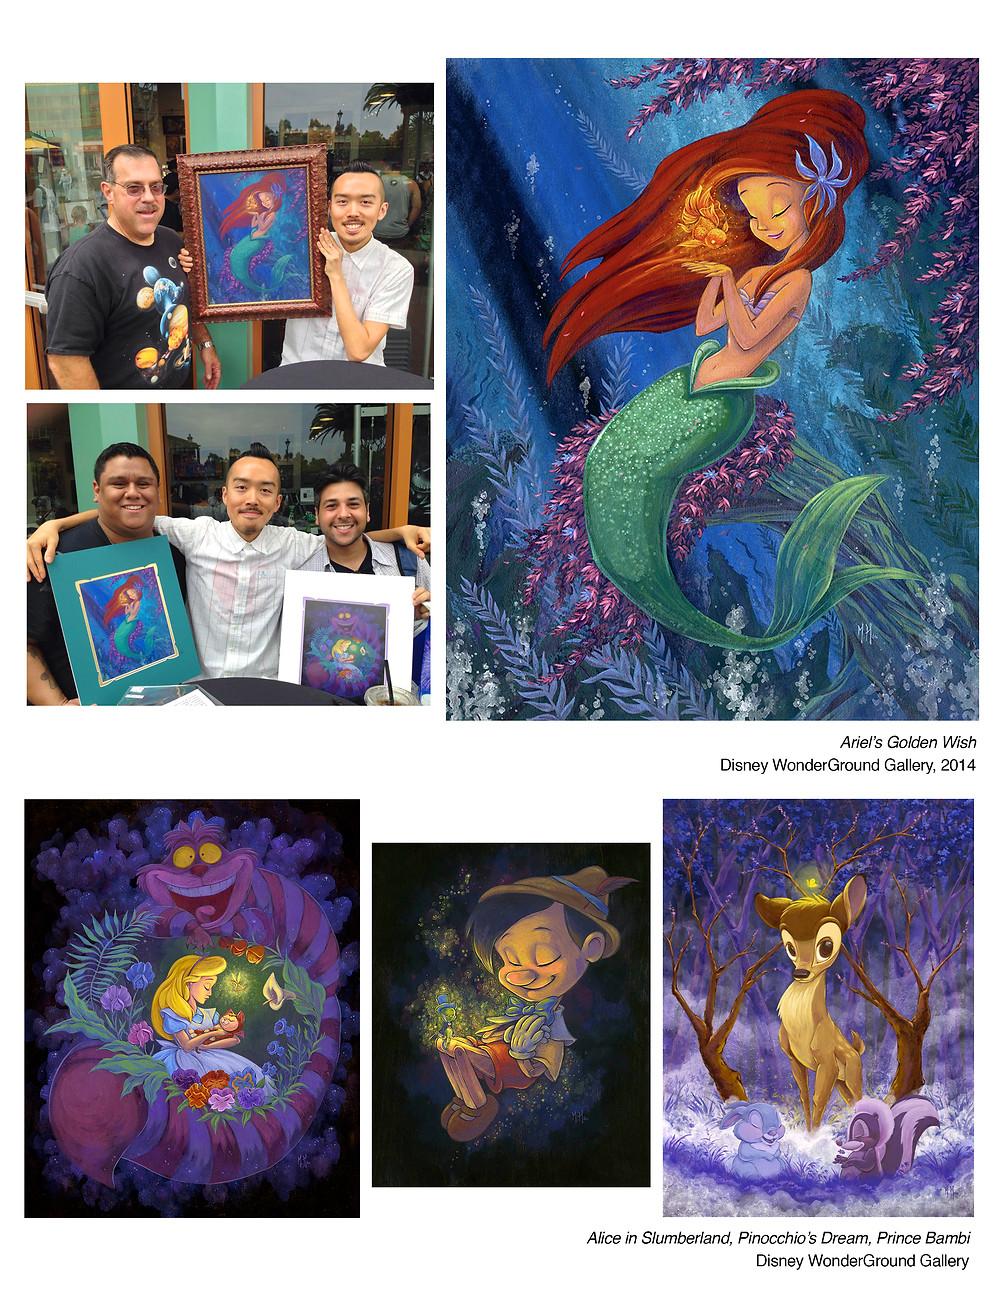 Ariel's Golden Wish & Alice in Slumberland, Pinocchio's Dream, Prince Bambi